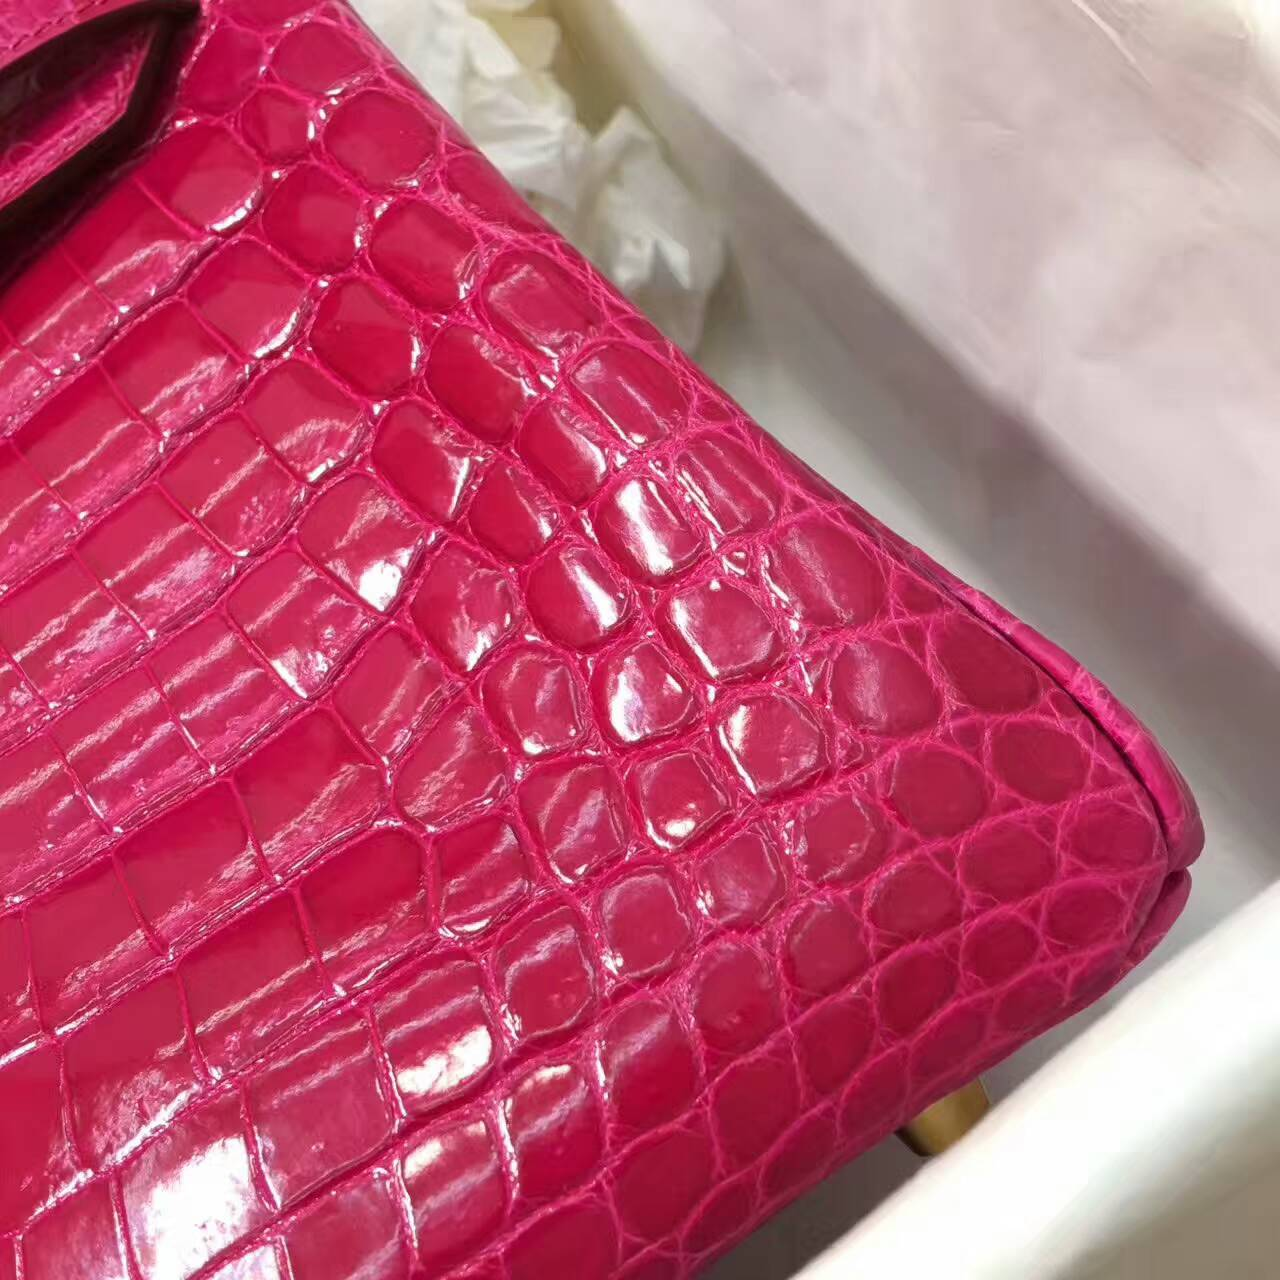 Birkin铂金包 Hermes包包 30cm Shiny Niloticus Crocodile 亮面两点非洲原产尼罗鳄 E5 Rose Tyrien 玫红 金扣